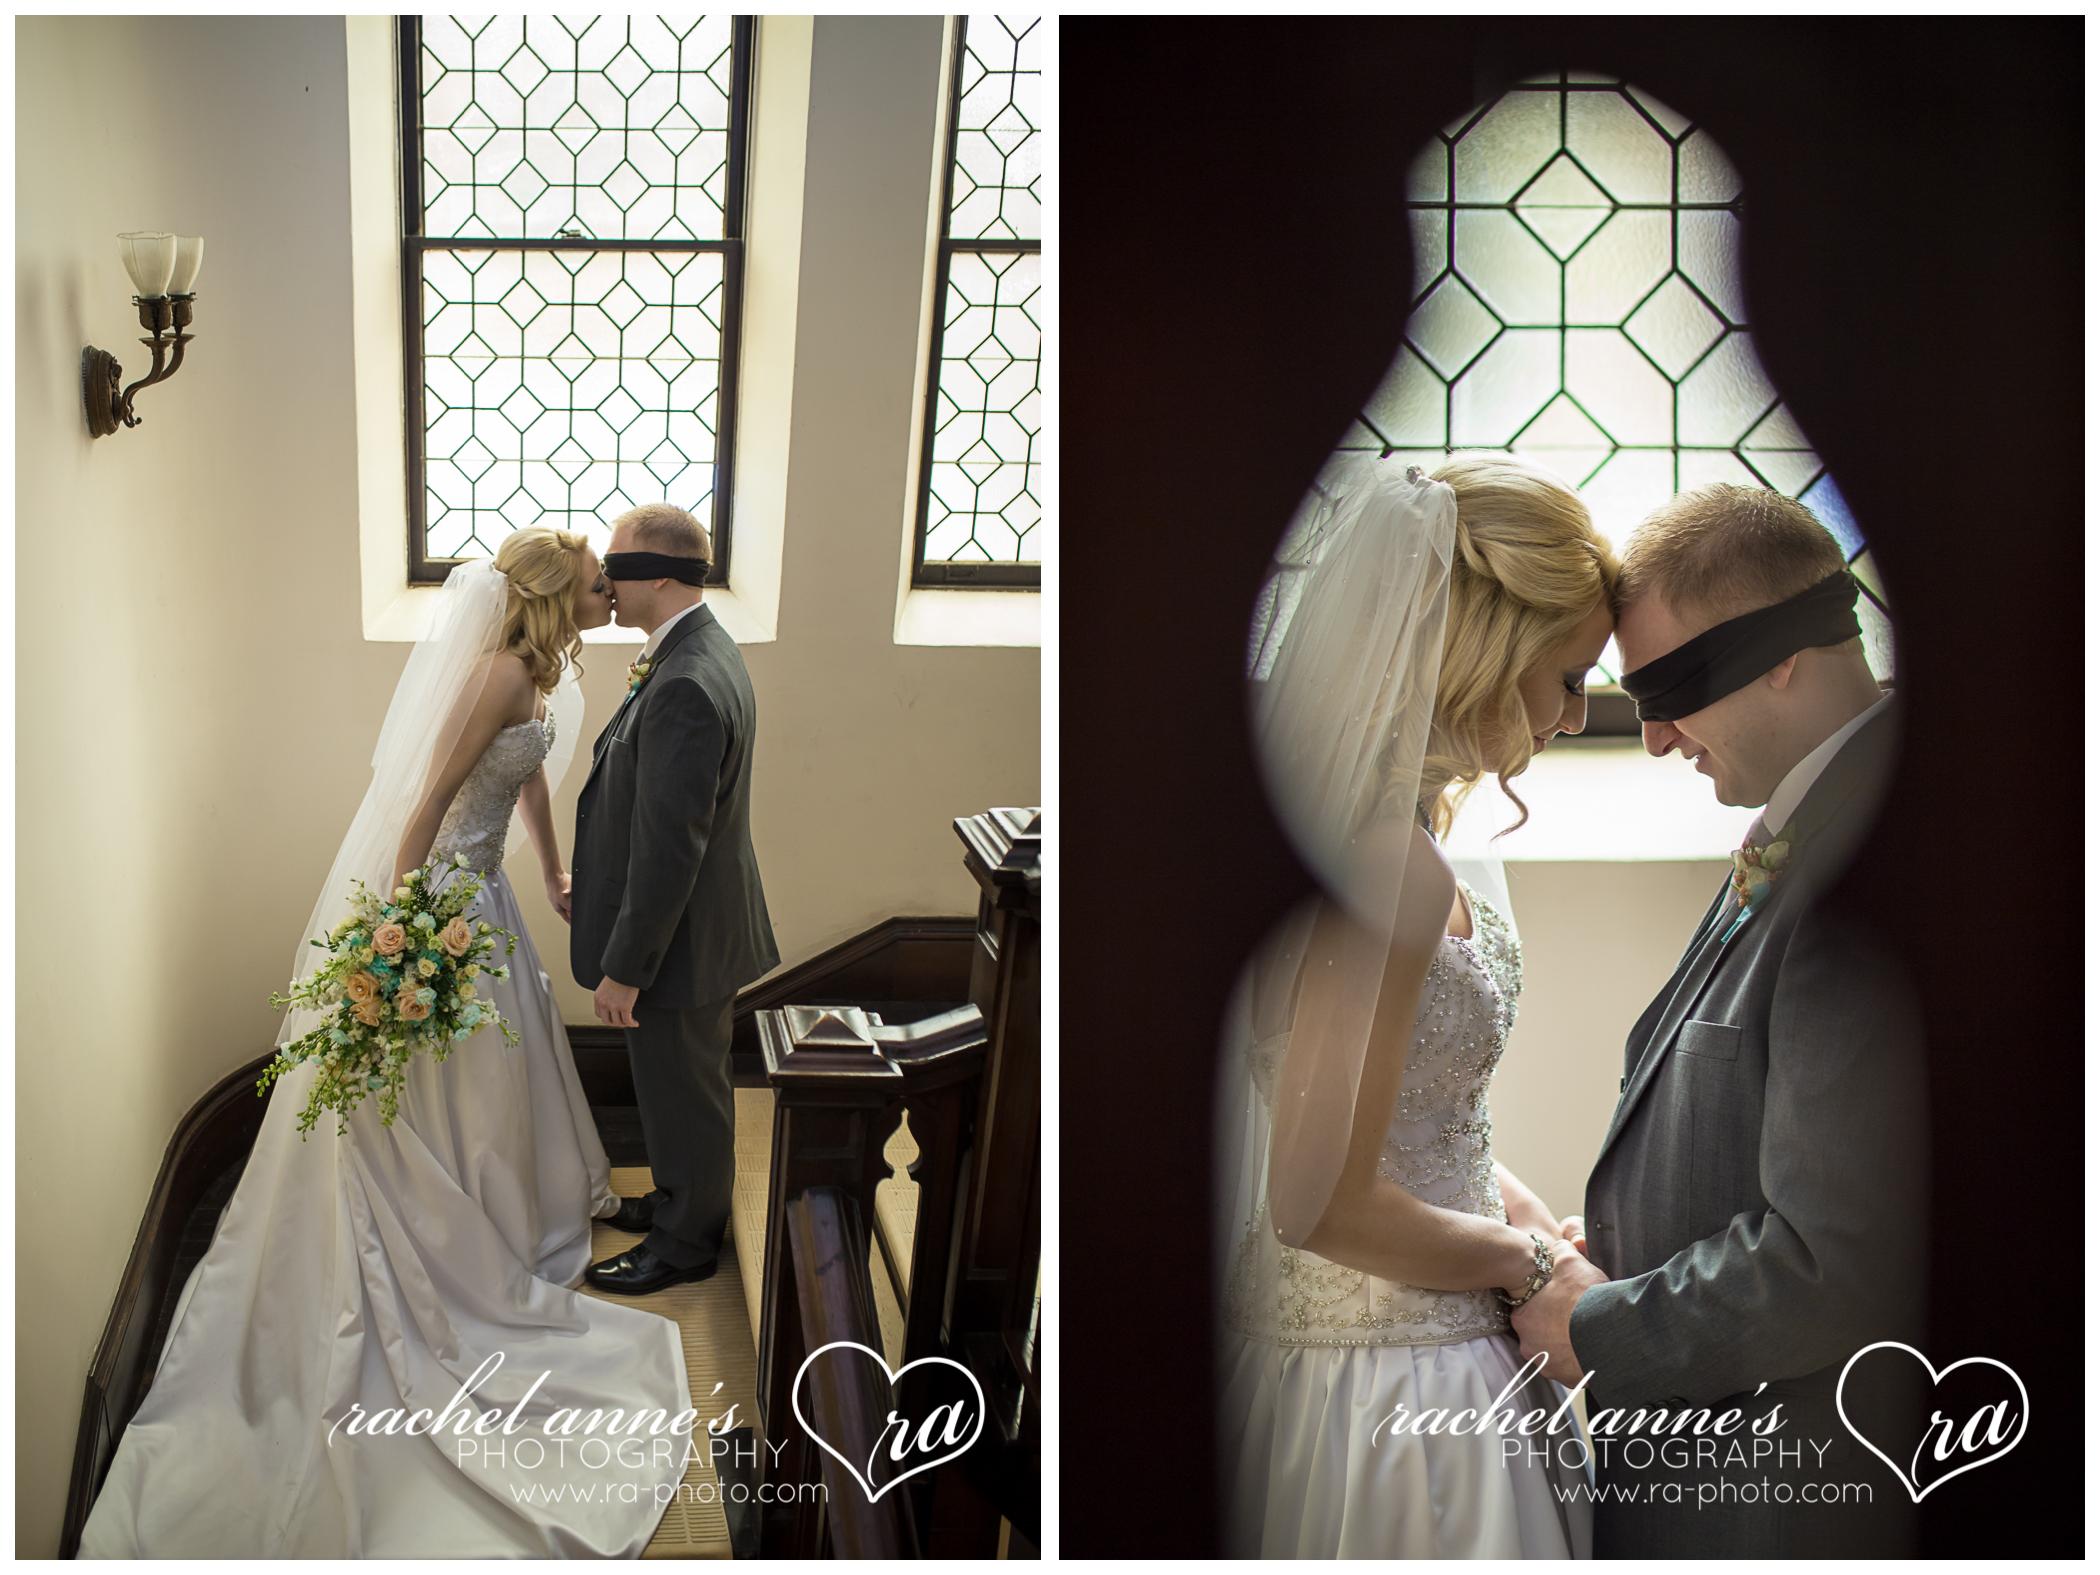 011-JKS-WEDDINGS-THE-FRANKLIN-PA.jpg